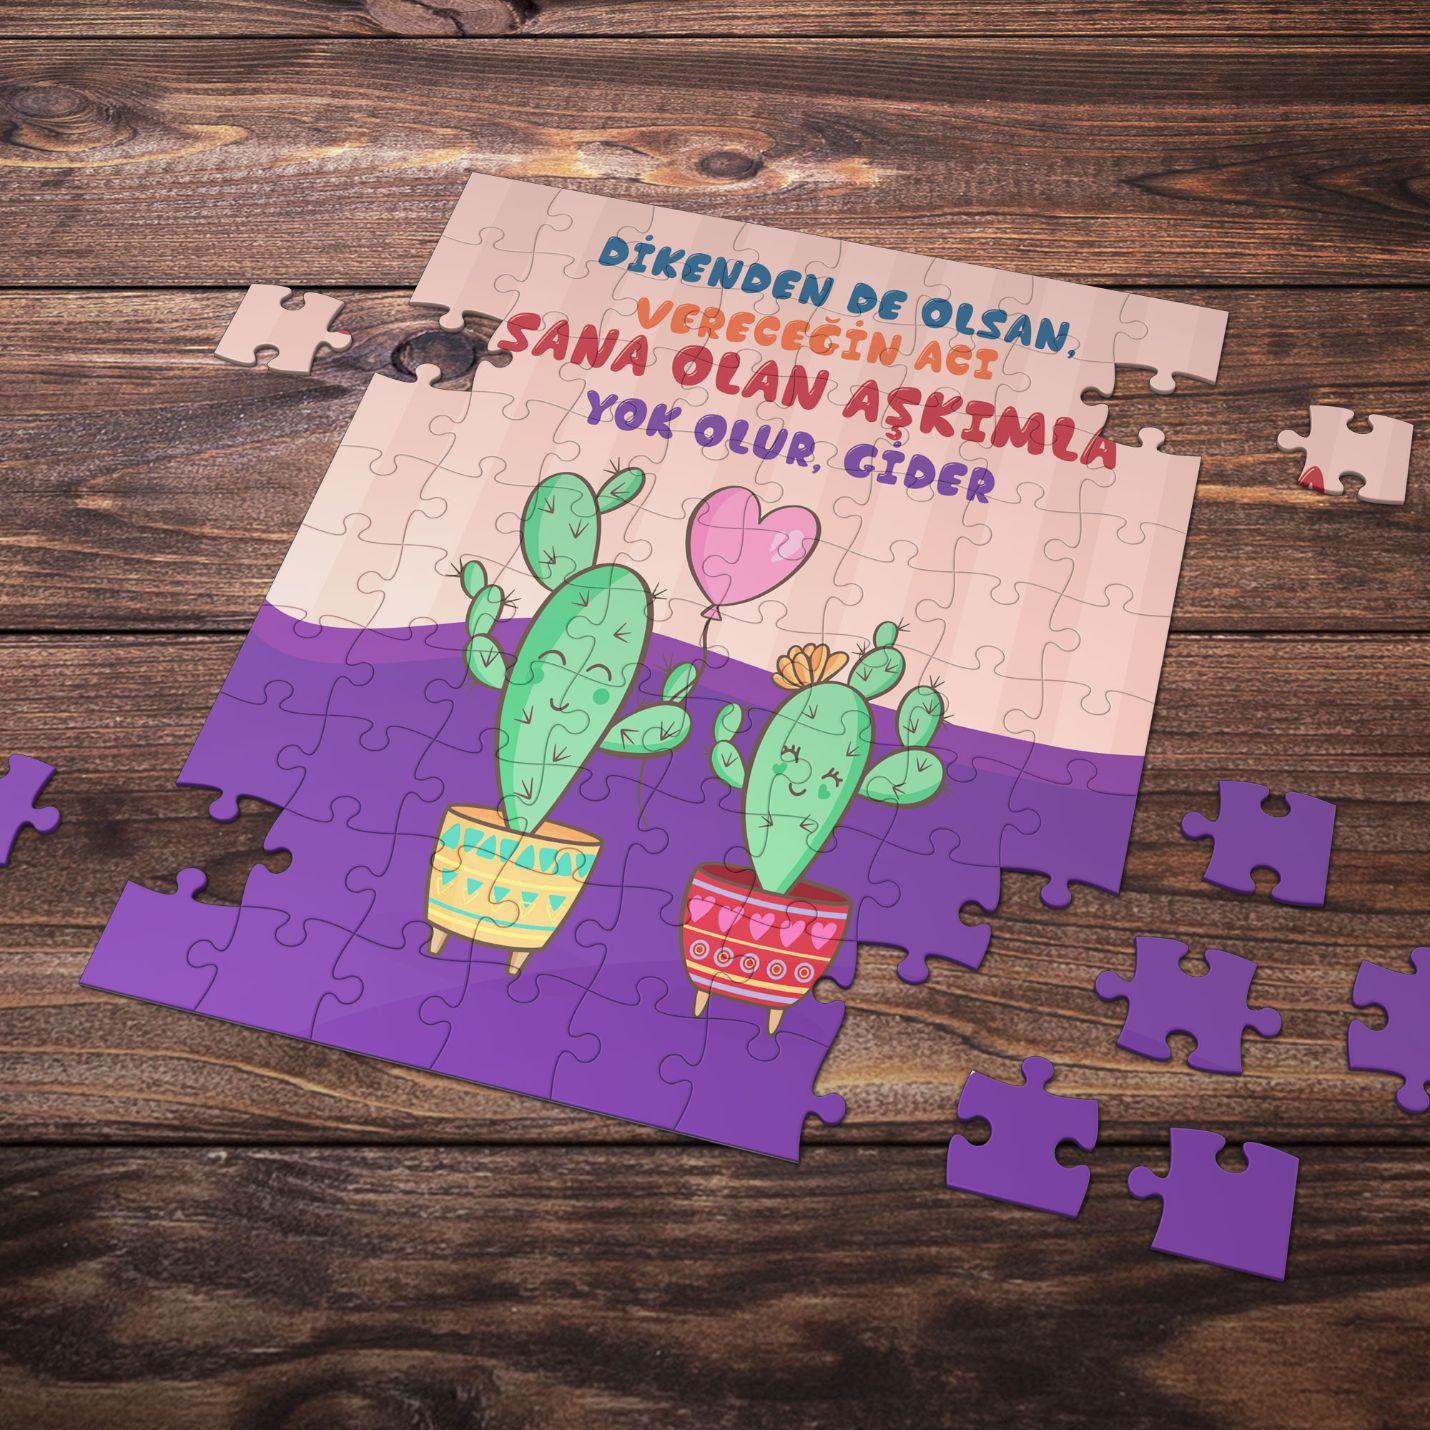 99 Parça Romantik Tasarımlı Puzzle Yapboz No9